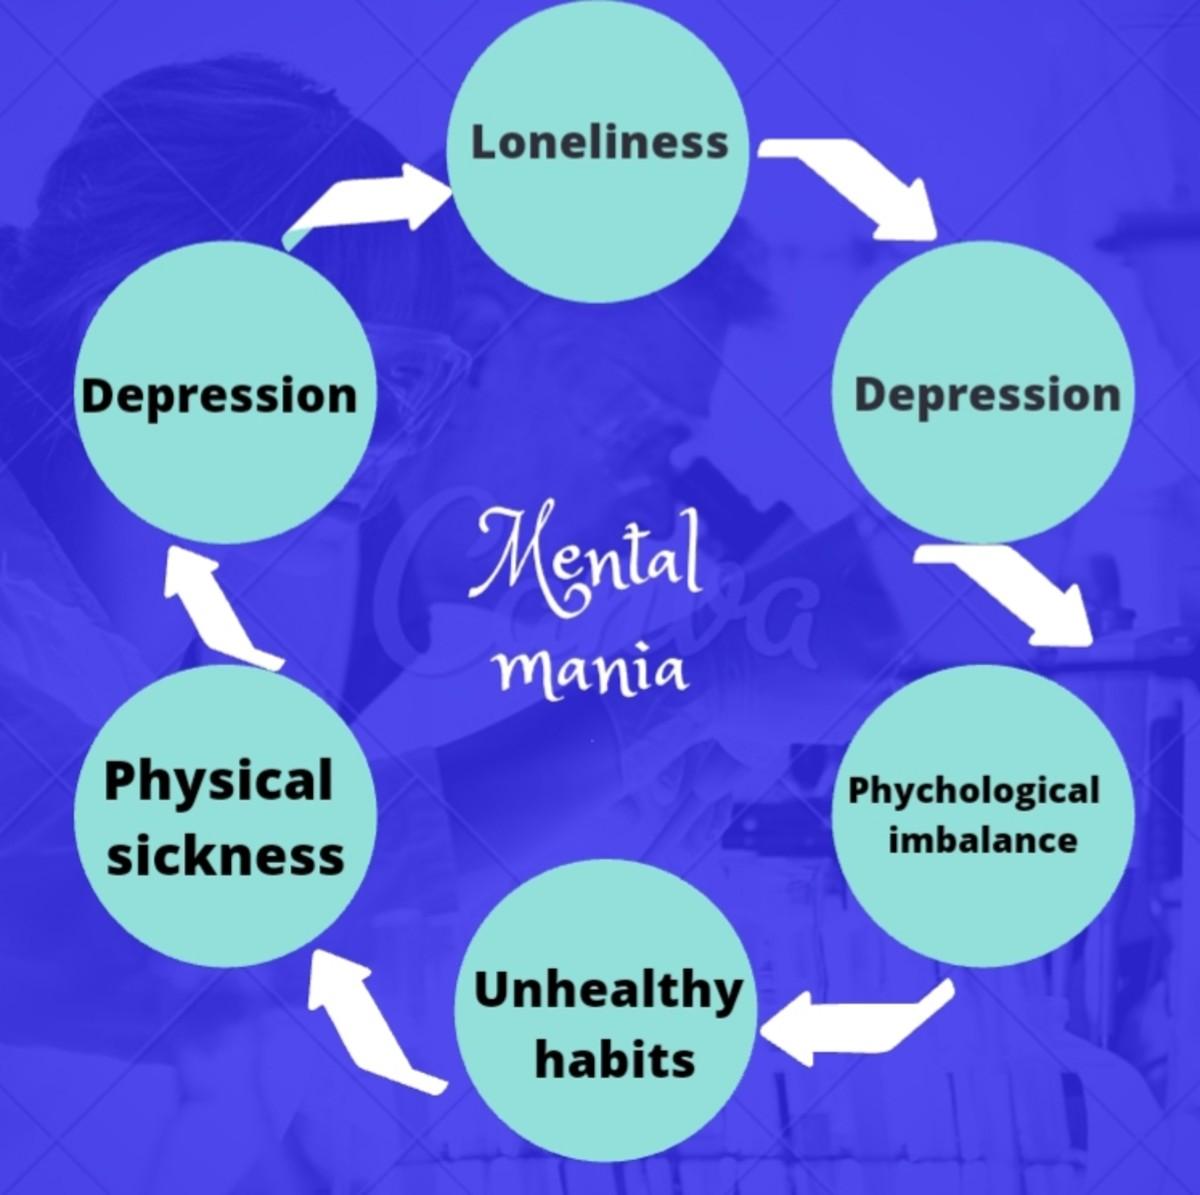 Vicious cycle of mental mania